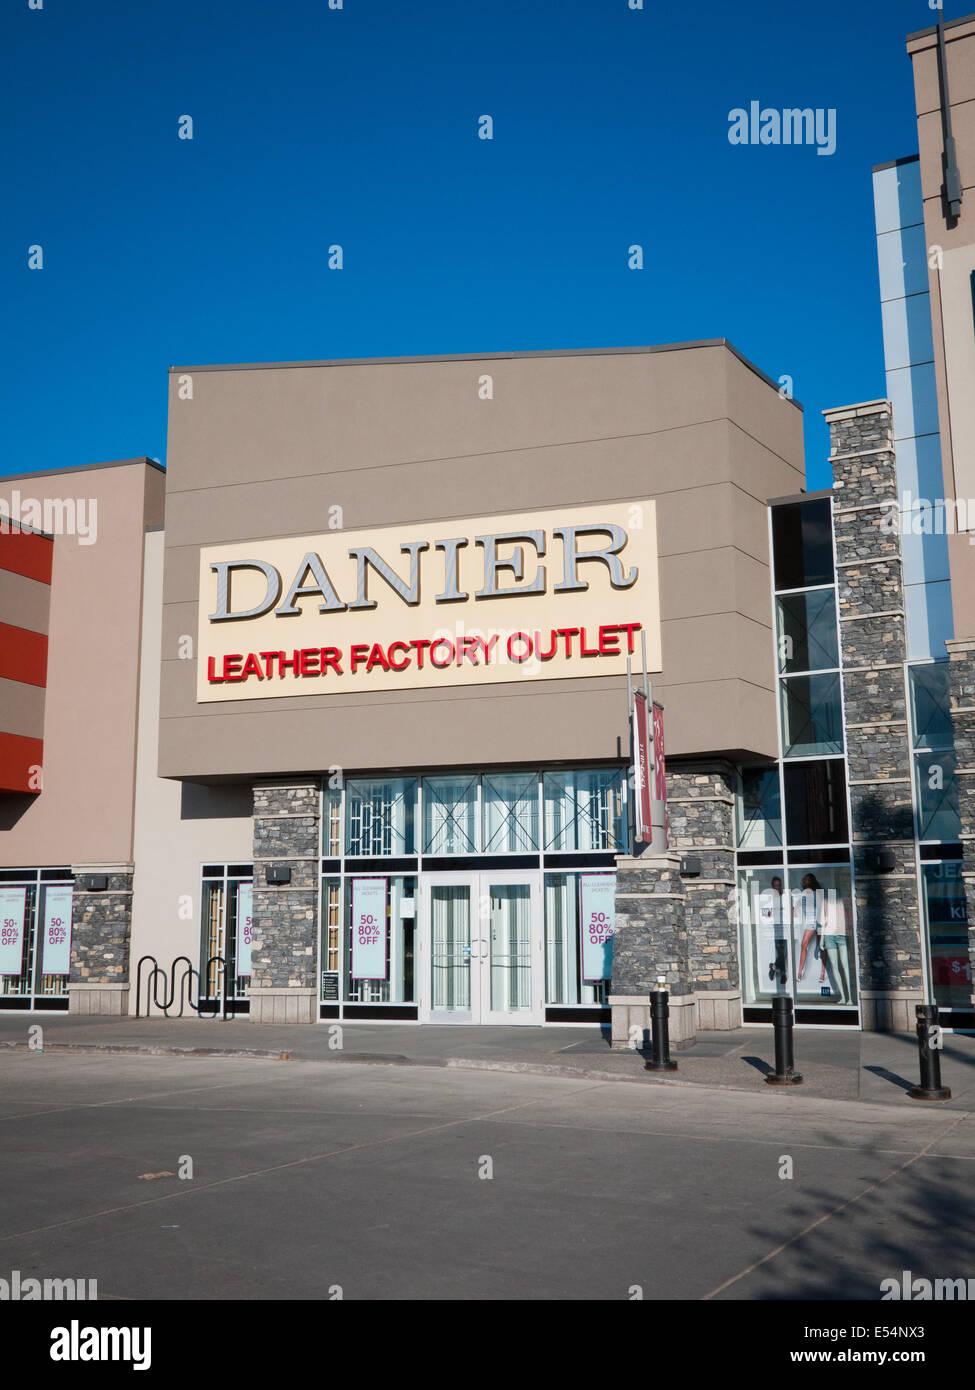 8f87c746f9c A Danier Leather factory outlet store at South Edmonton Common in Edmonton